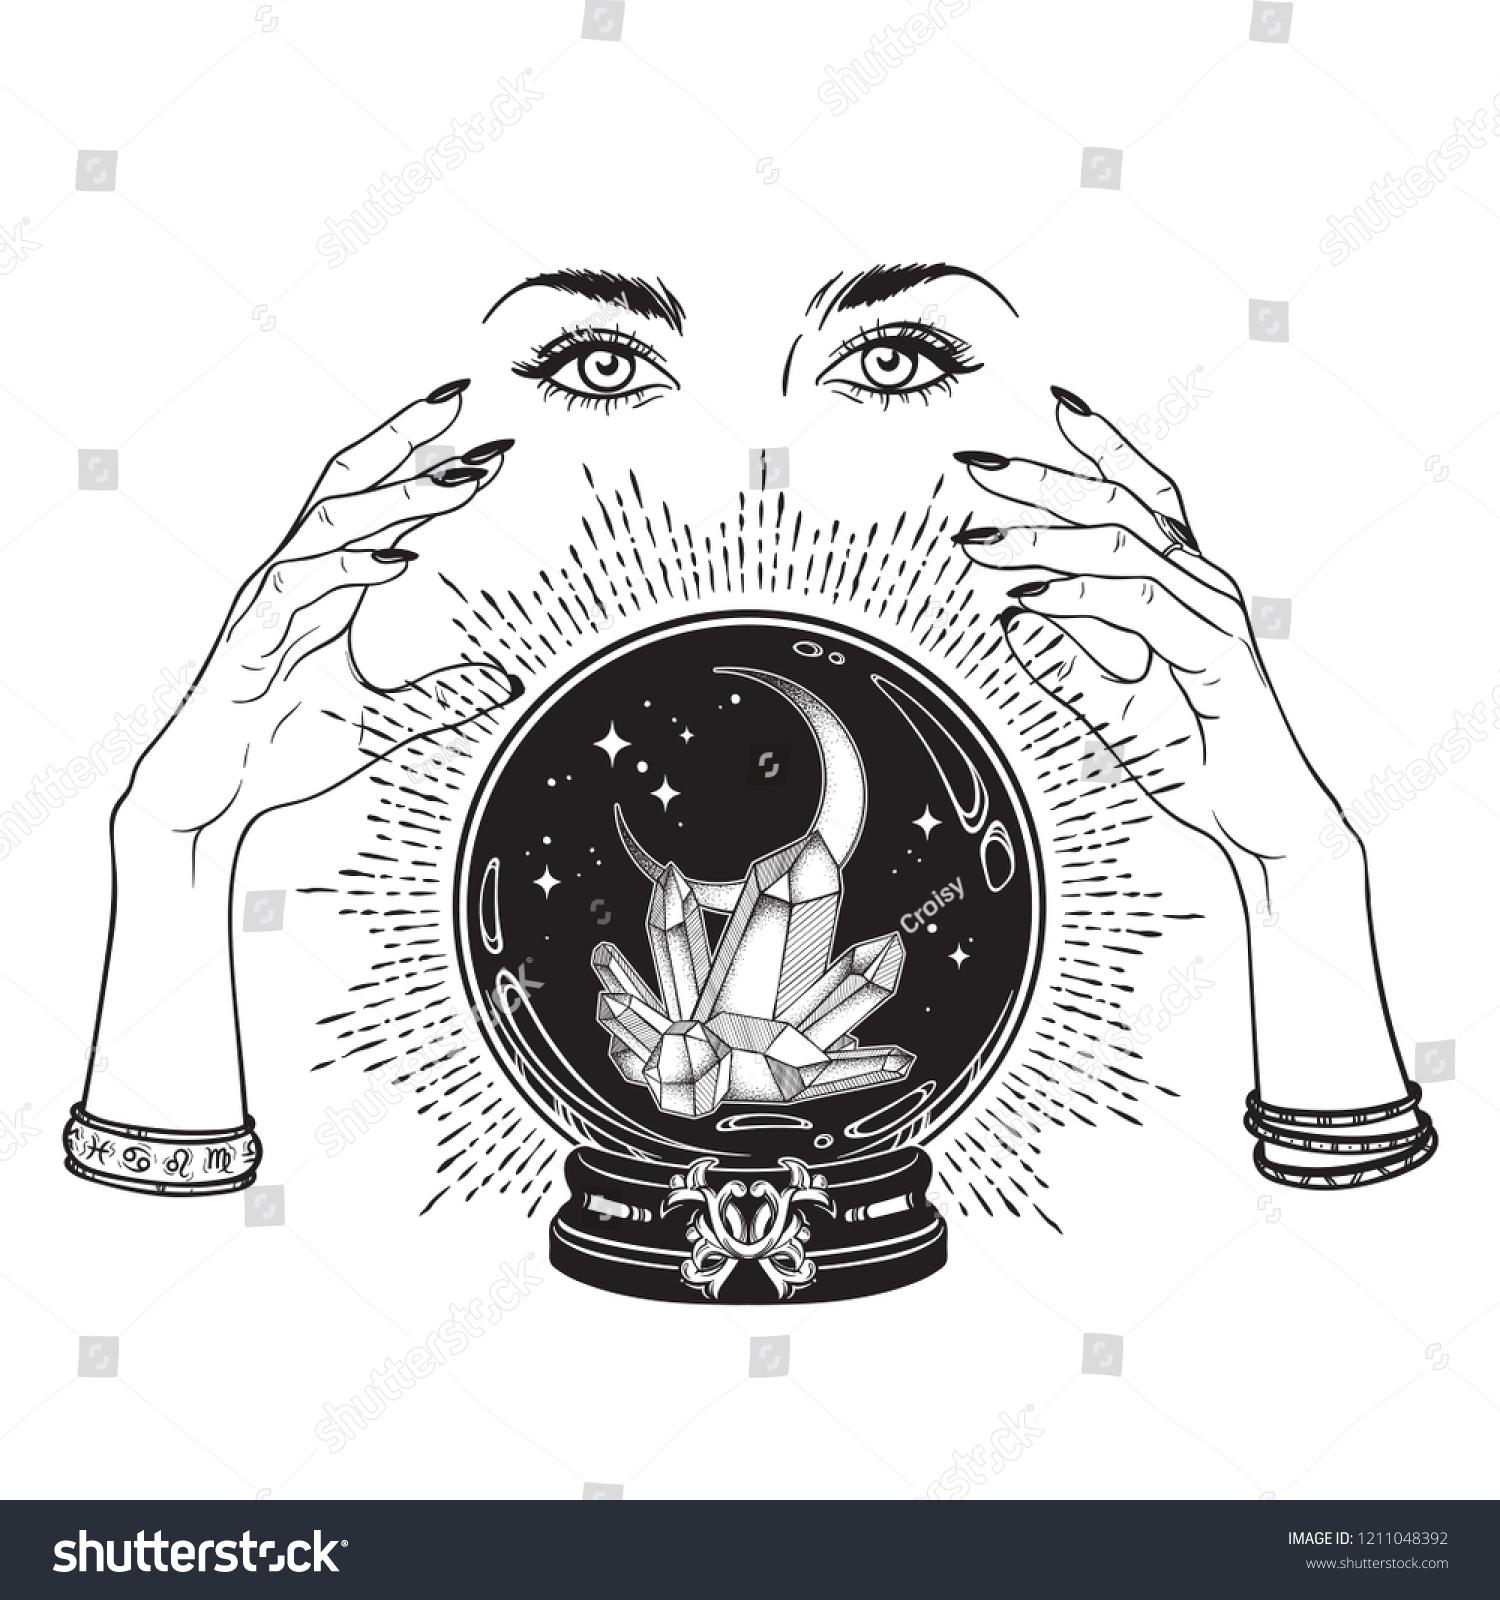 Moons and Stars Digital Cut File metaphysical DIGITAL DOWNLOAD Hand-drawn Magic Crystal Ball Earrings svg